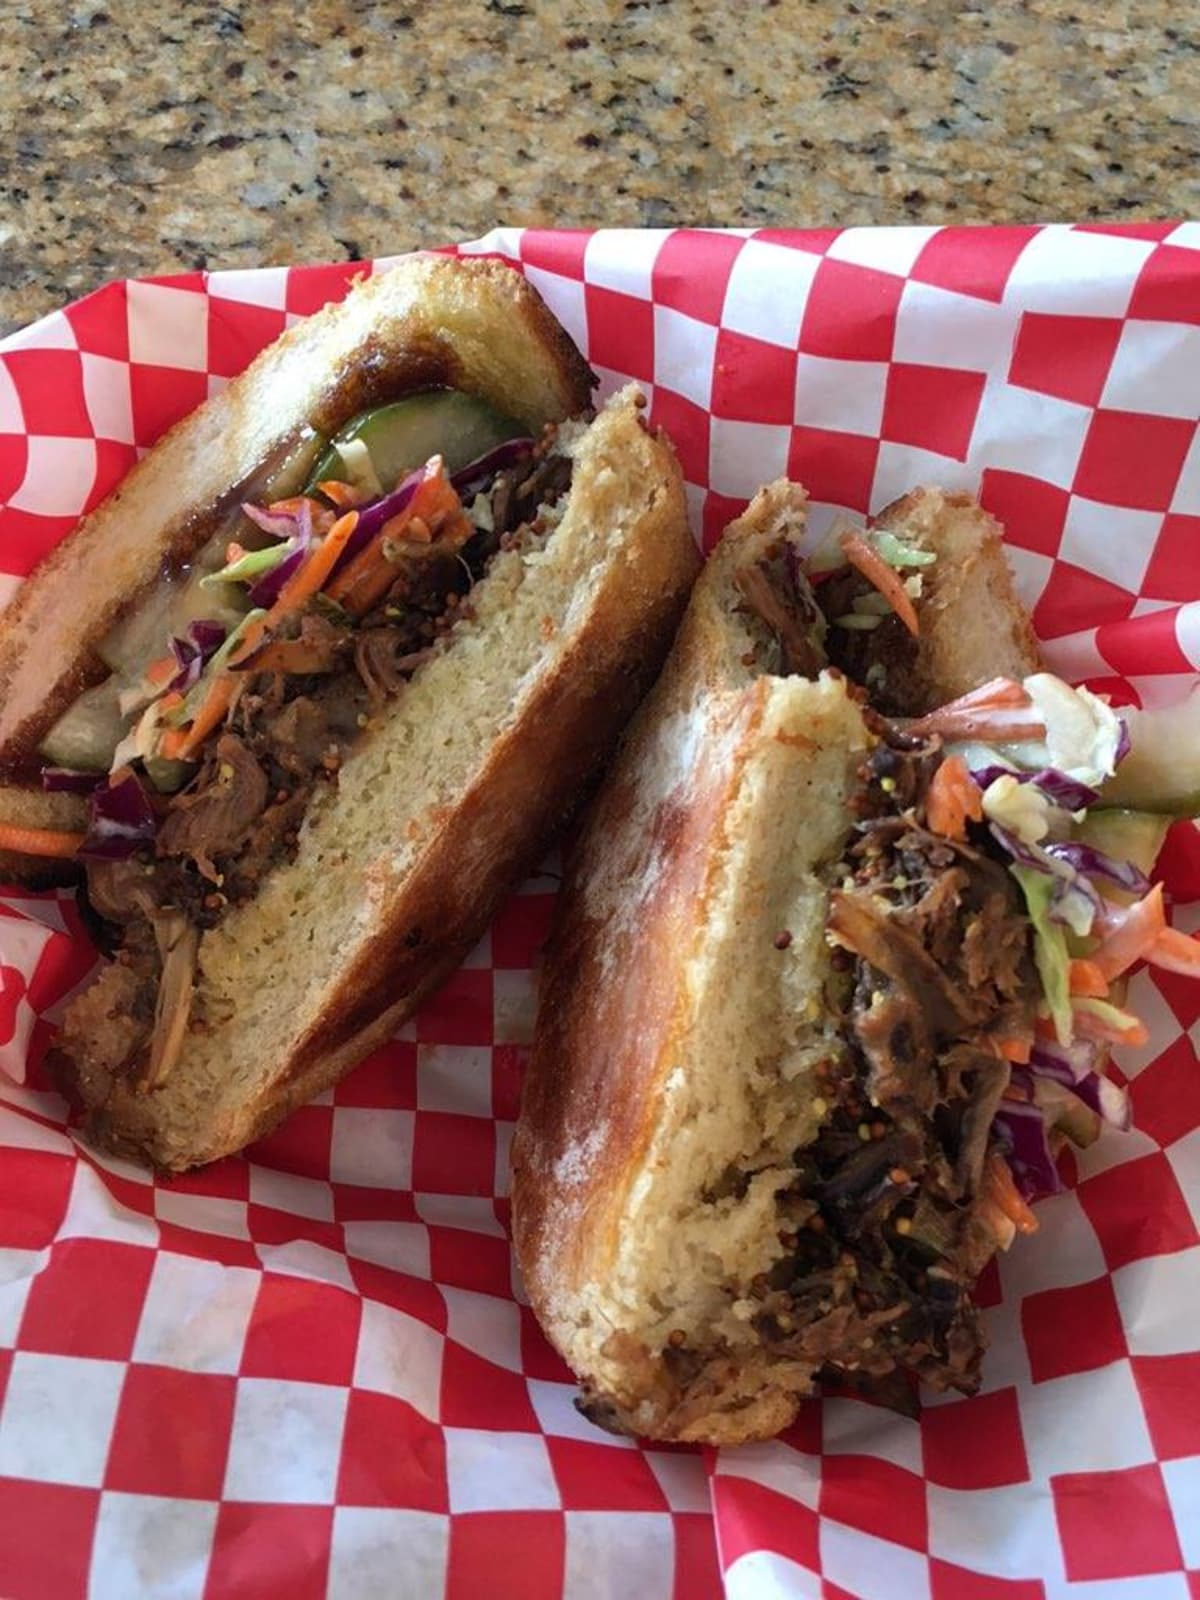 Lucky Fig food truck sandwich